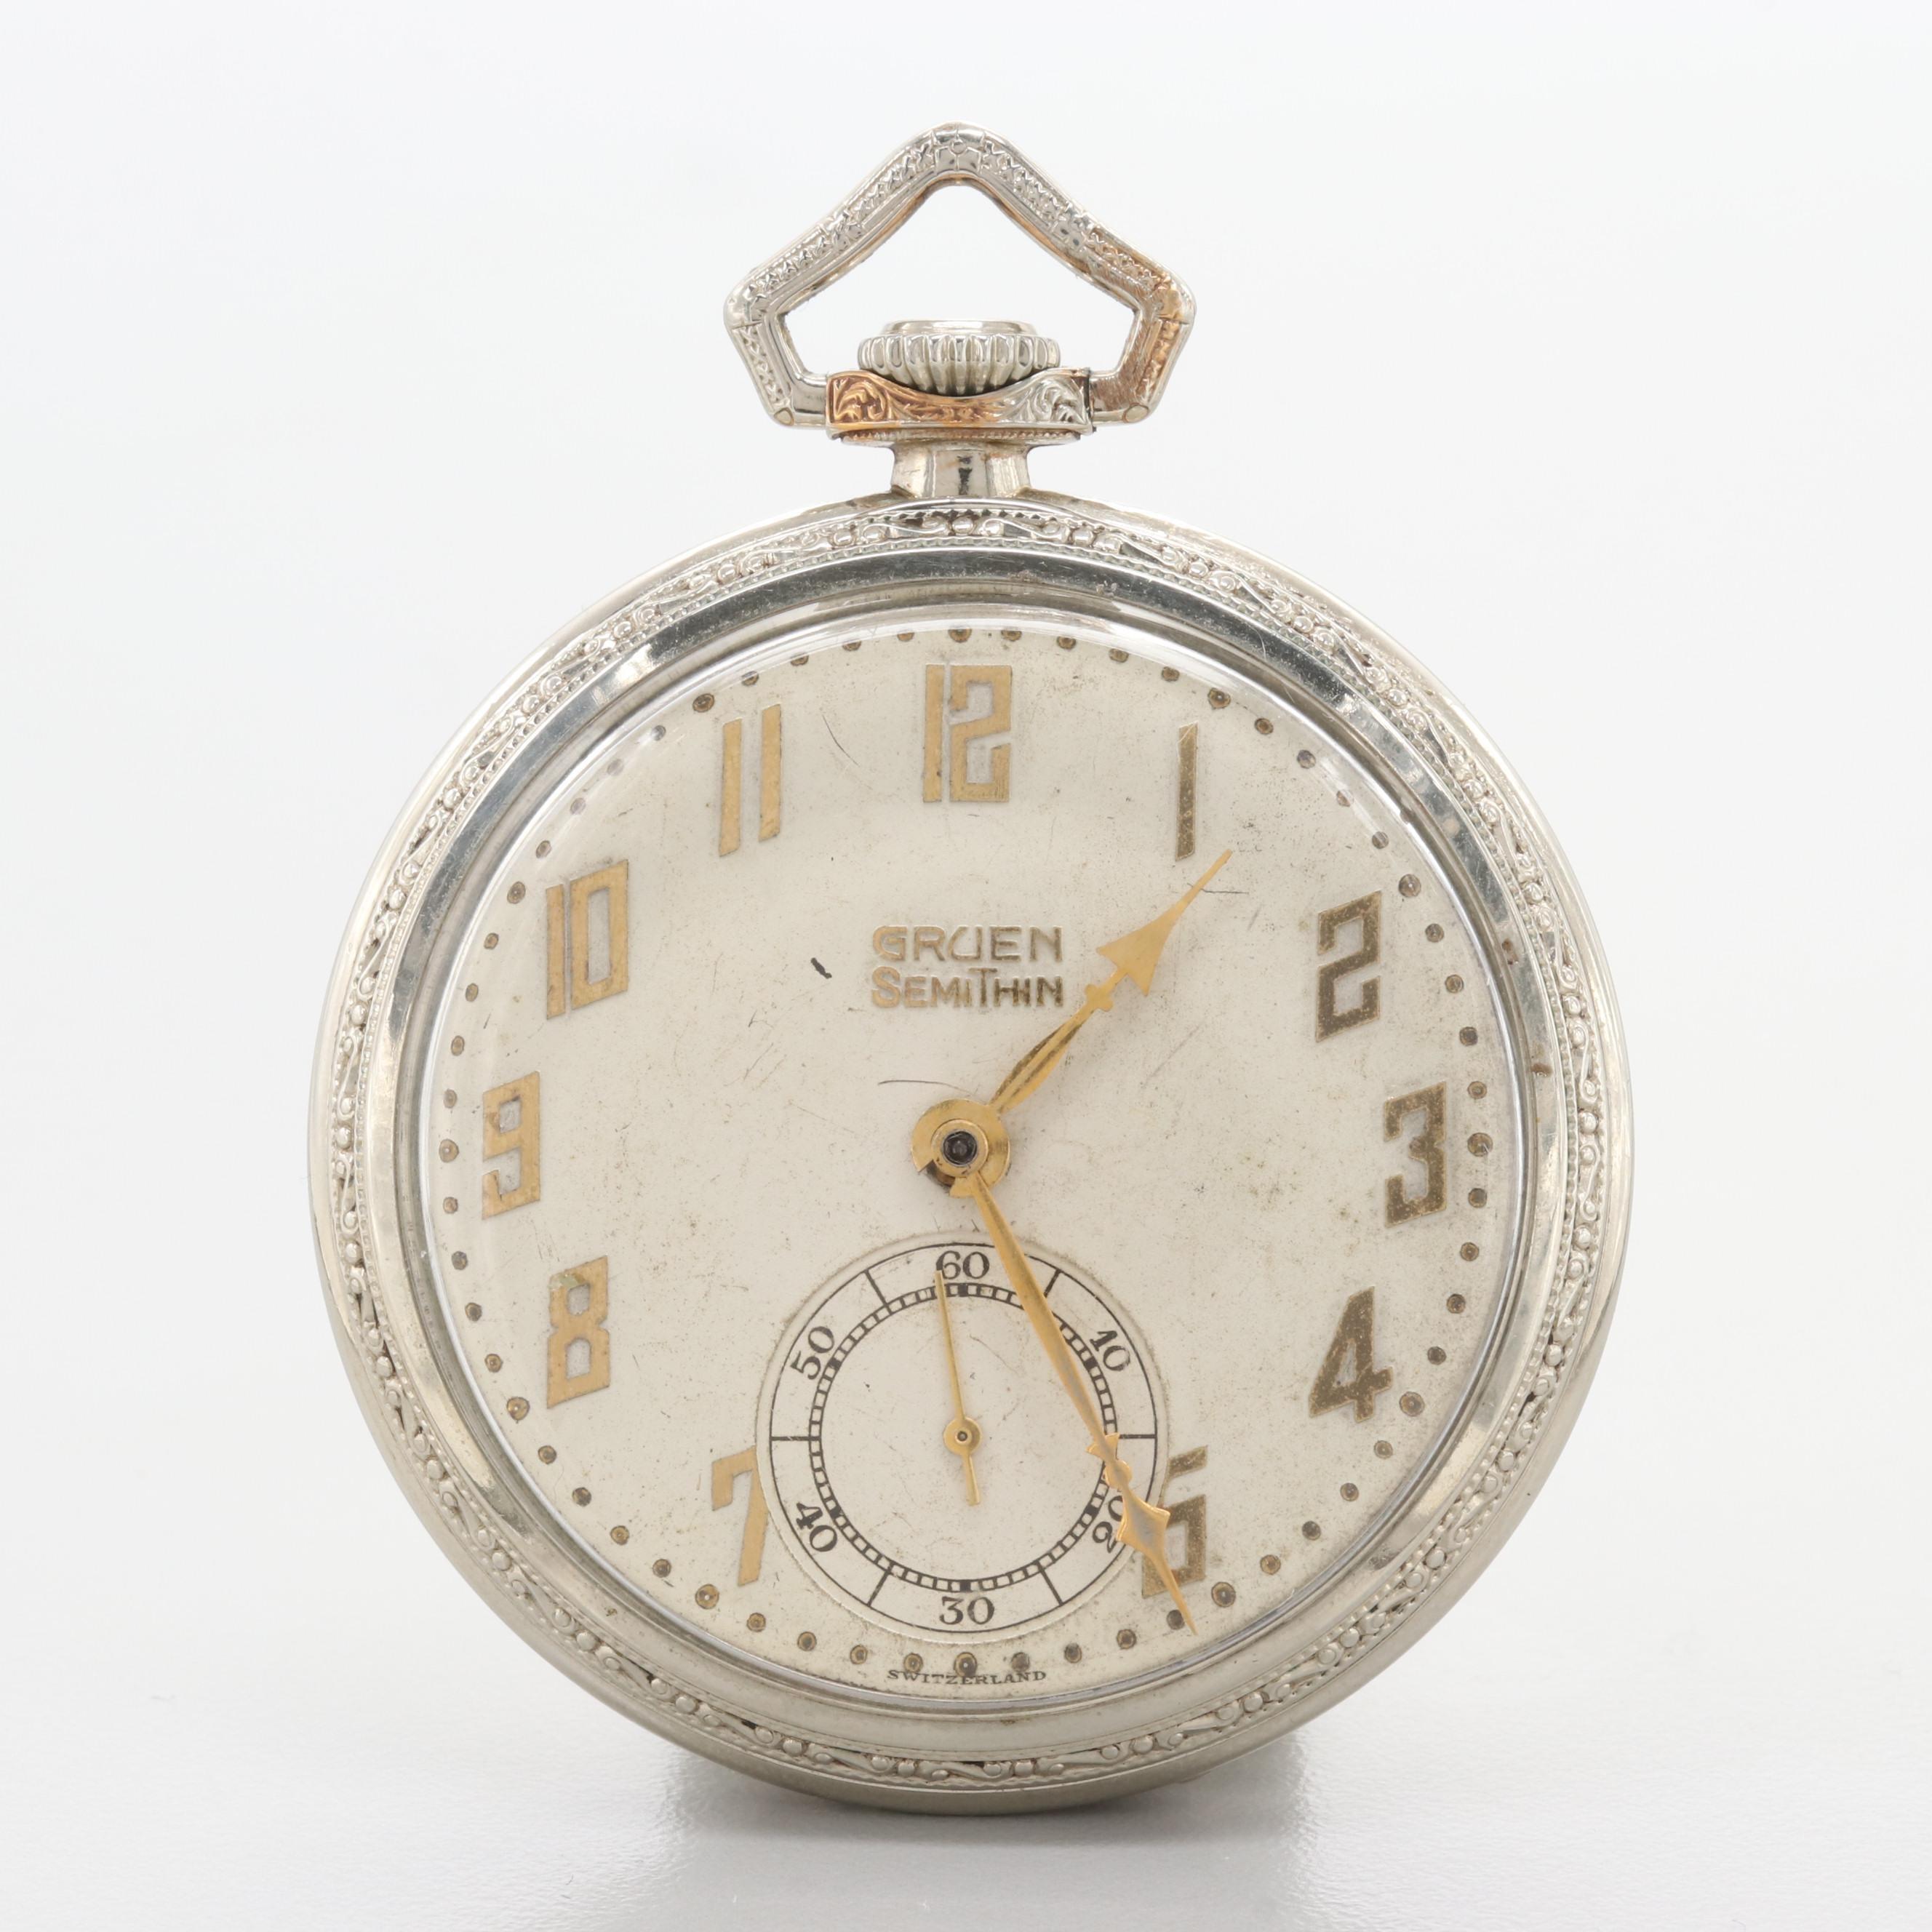 Gruen Semi-Thin Open Face Pocket Watch